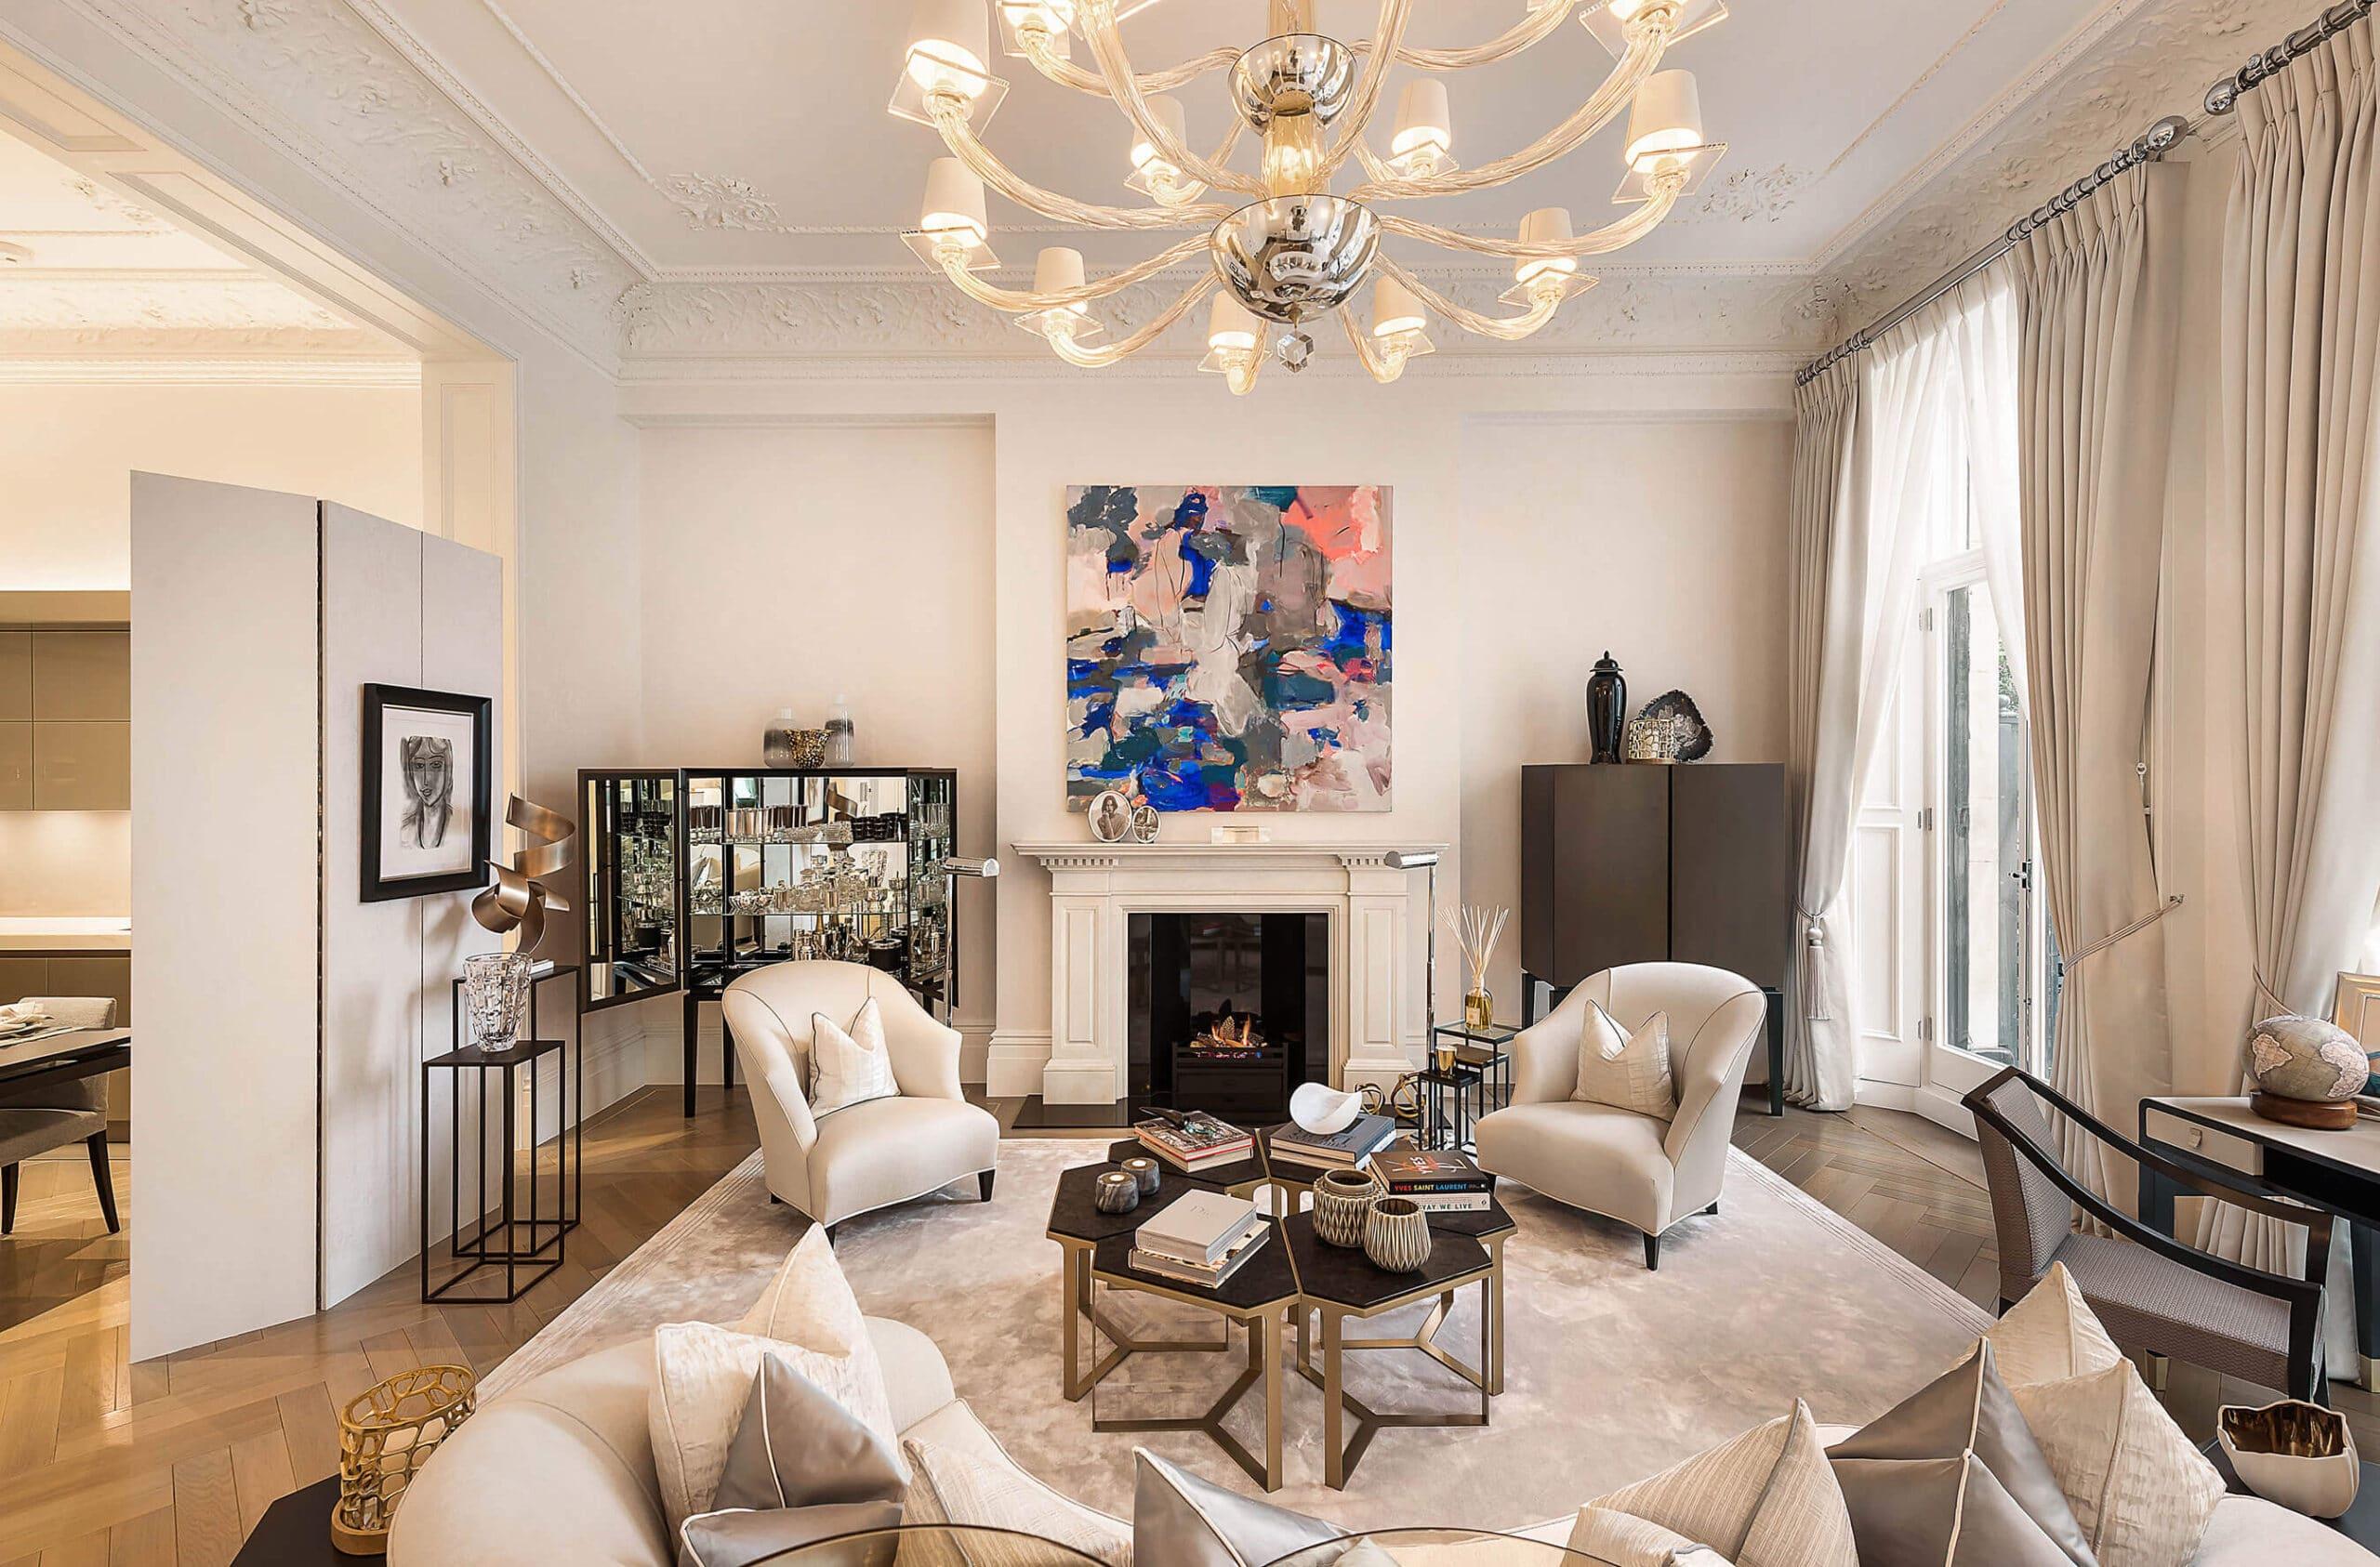 luxury interior design project in knightsbridge, London